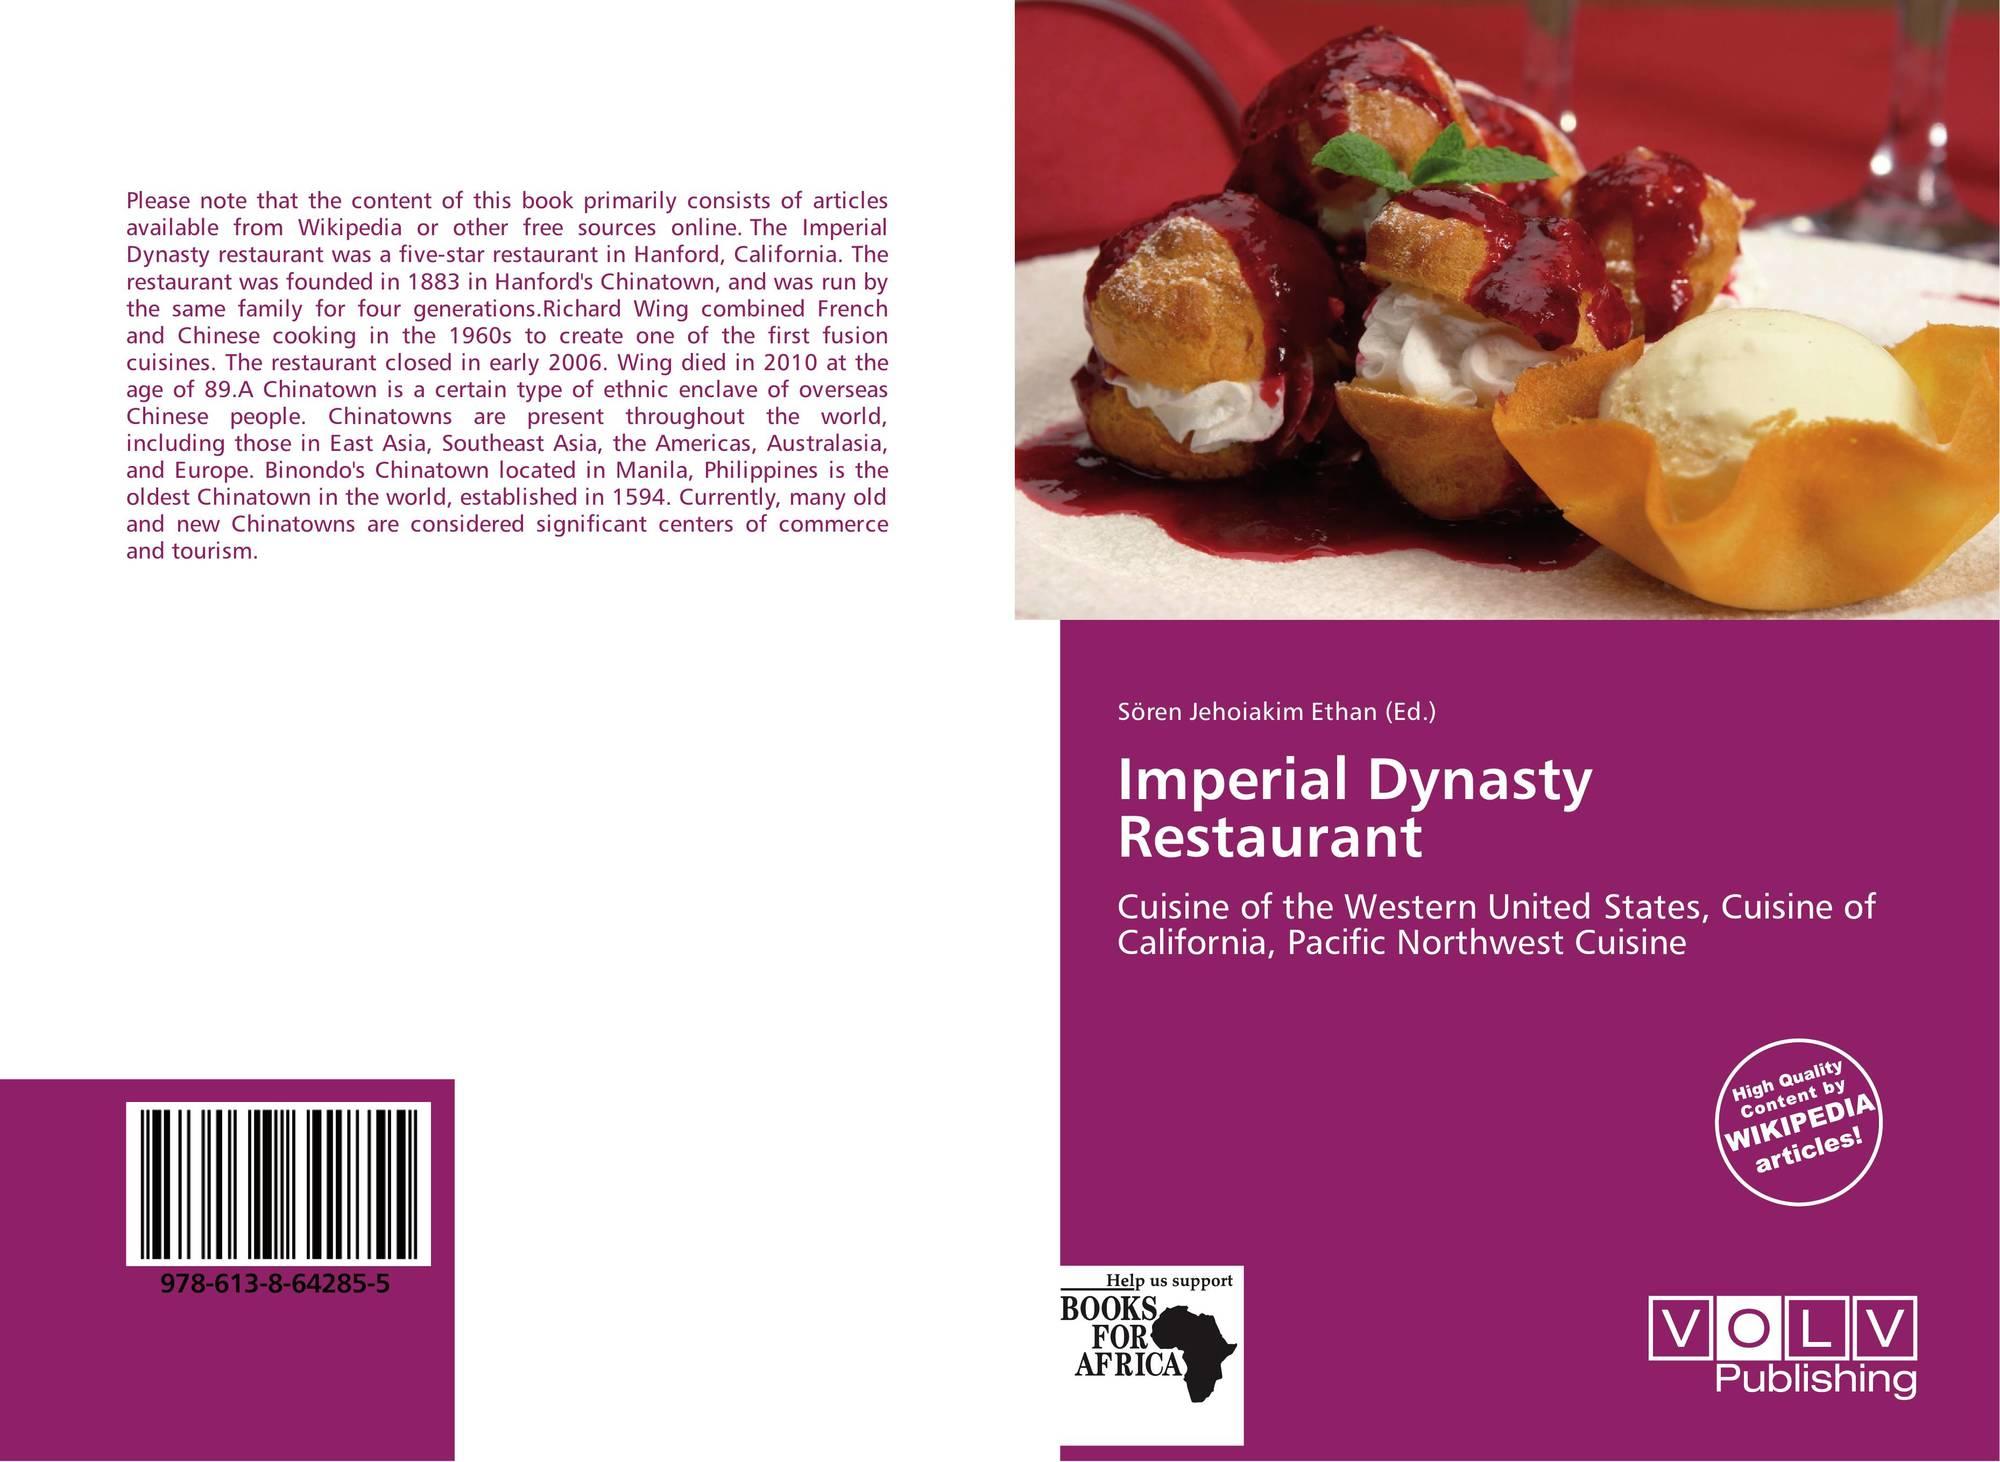 Imperial Dynasty Restaurant, 32 32 32 6423232 32, 323264232326 ...